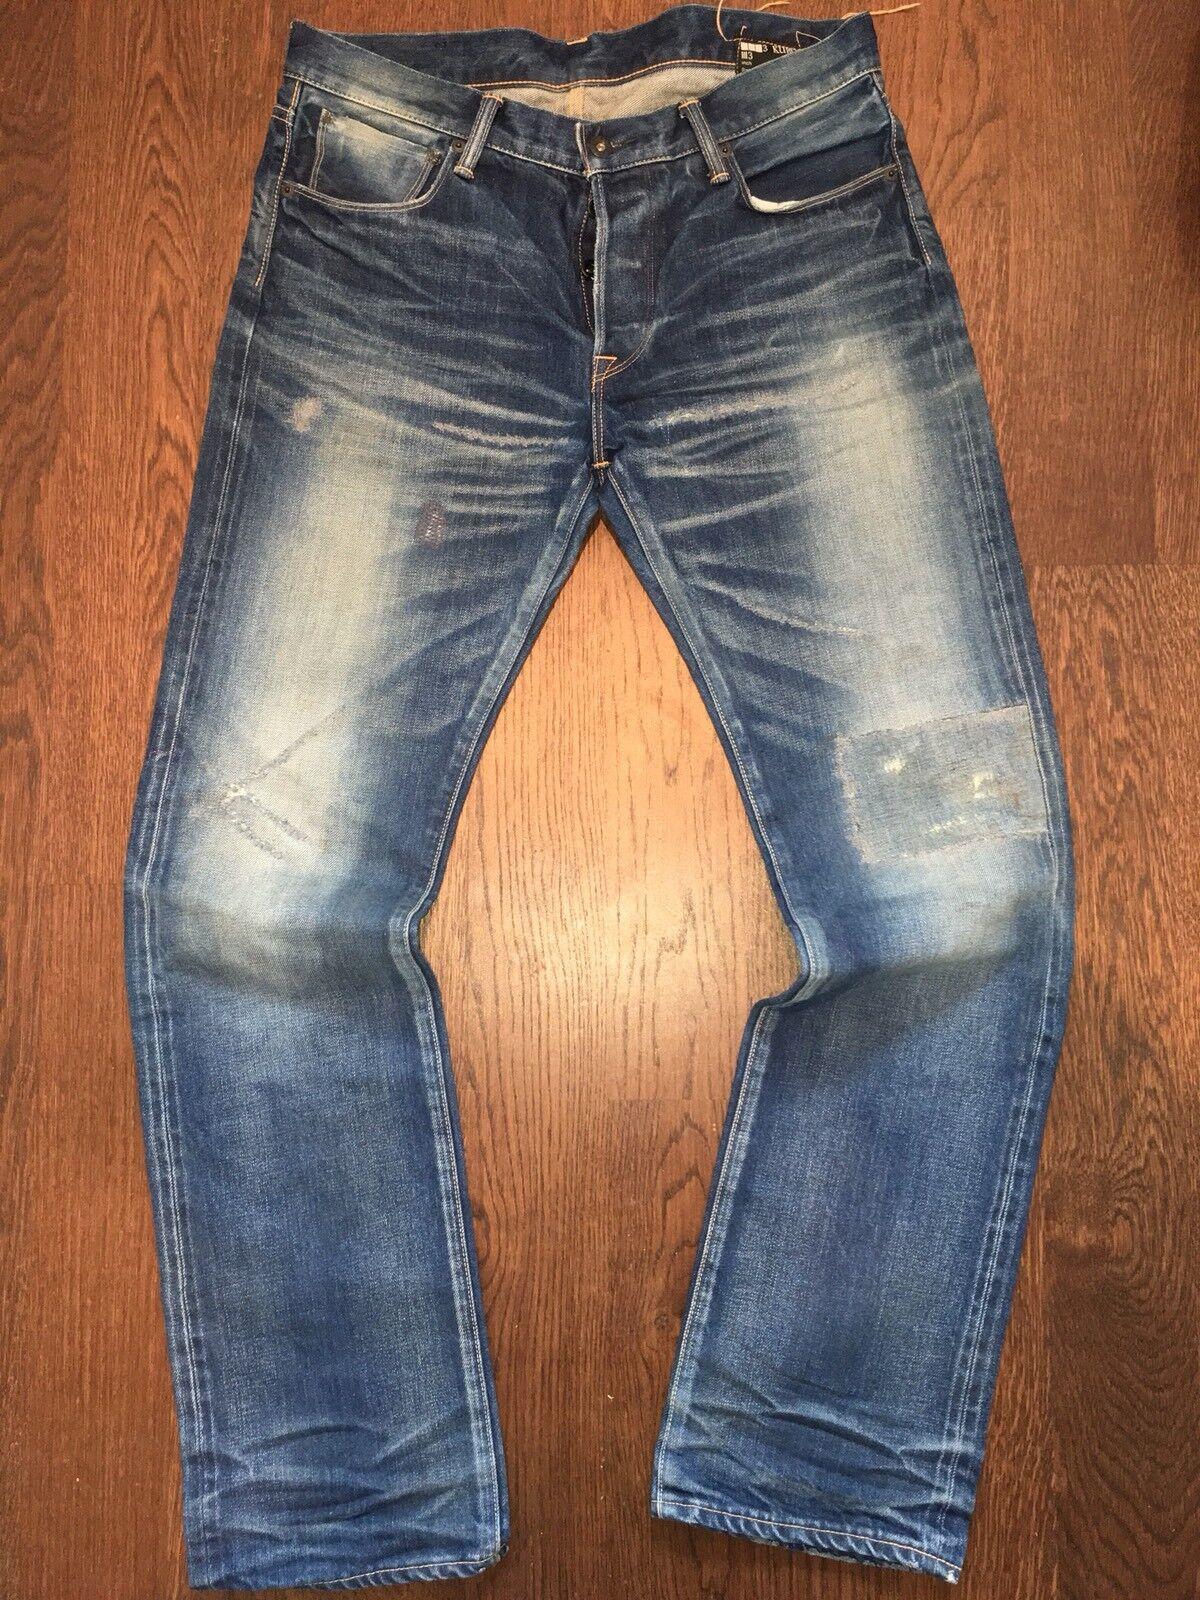 Kuro Graphite Jeans Made In Japan Neuw. Neuw. Neuw. Gr. 33 8e1641